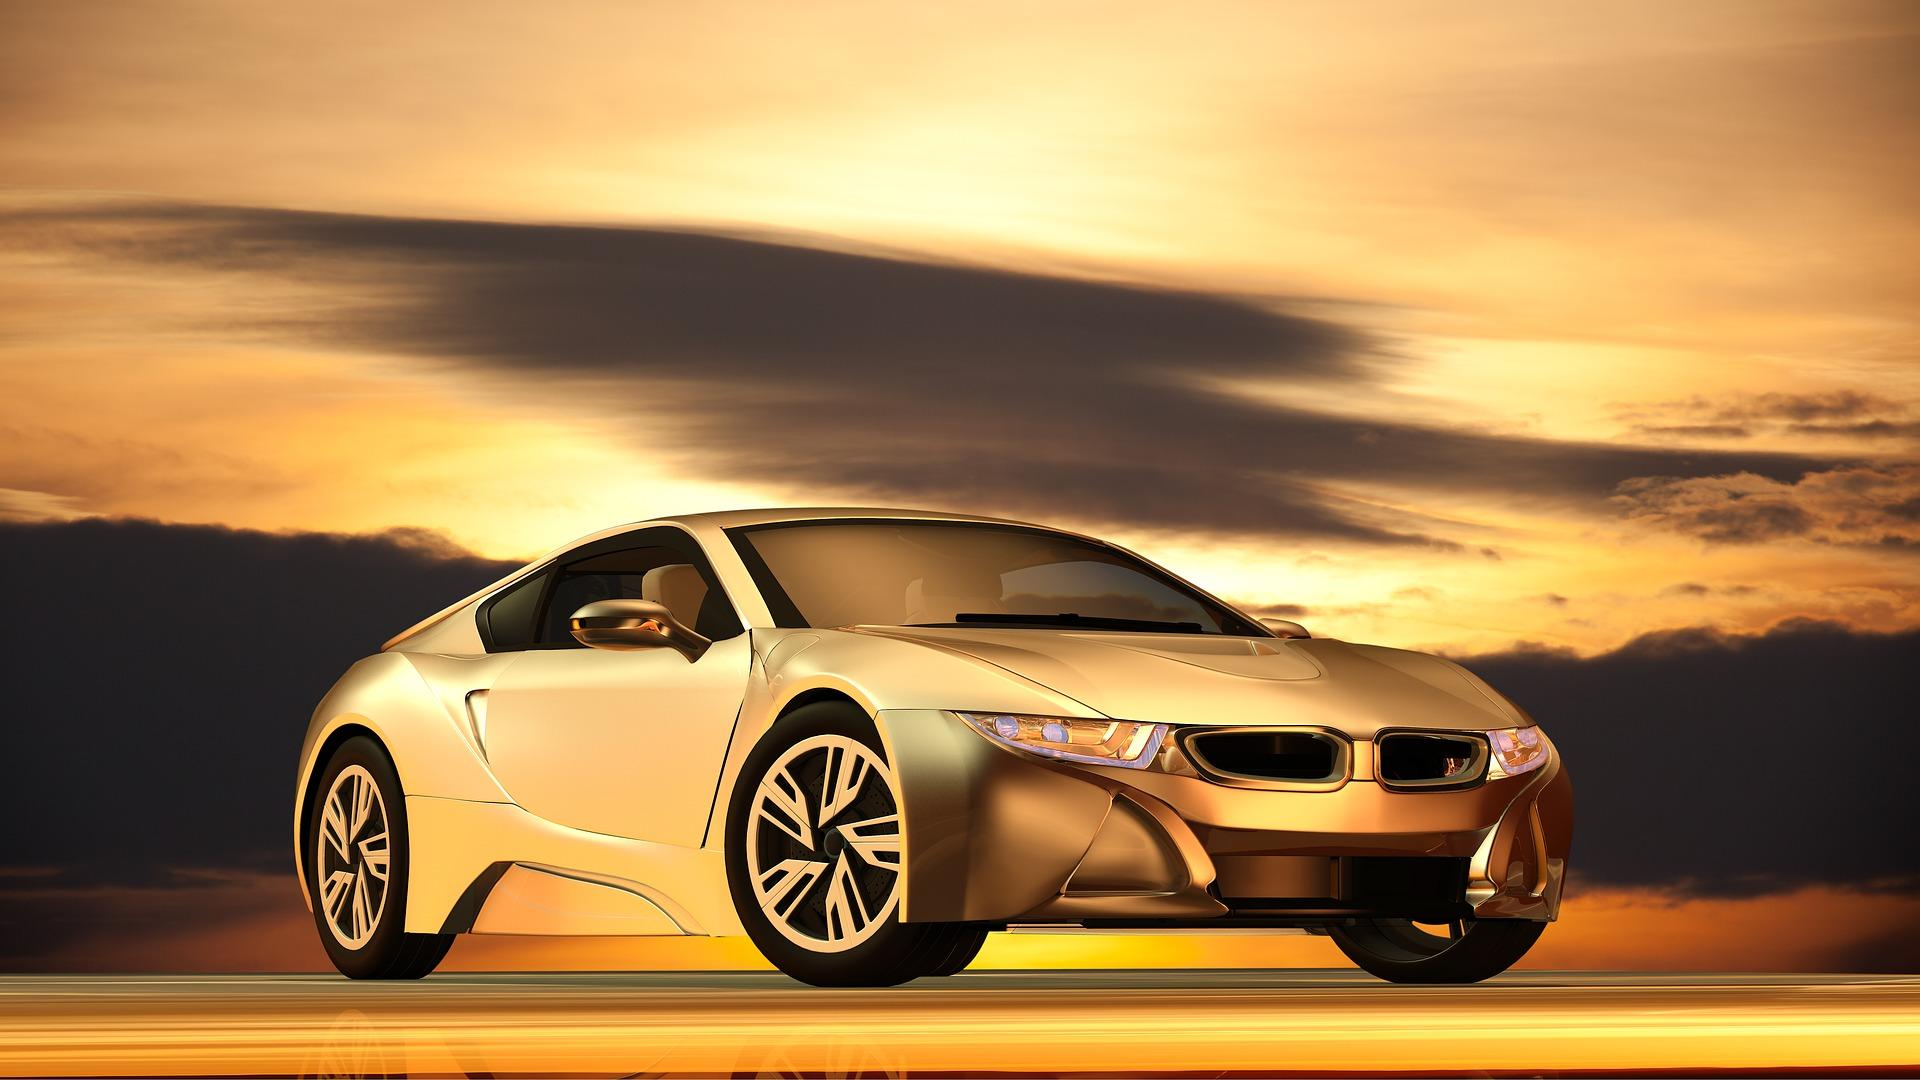 electric-car-1633932_1920-1499284583471.jpg